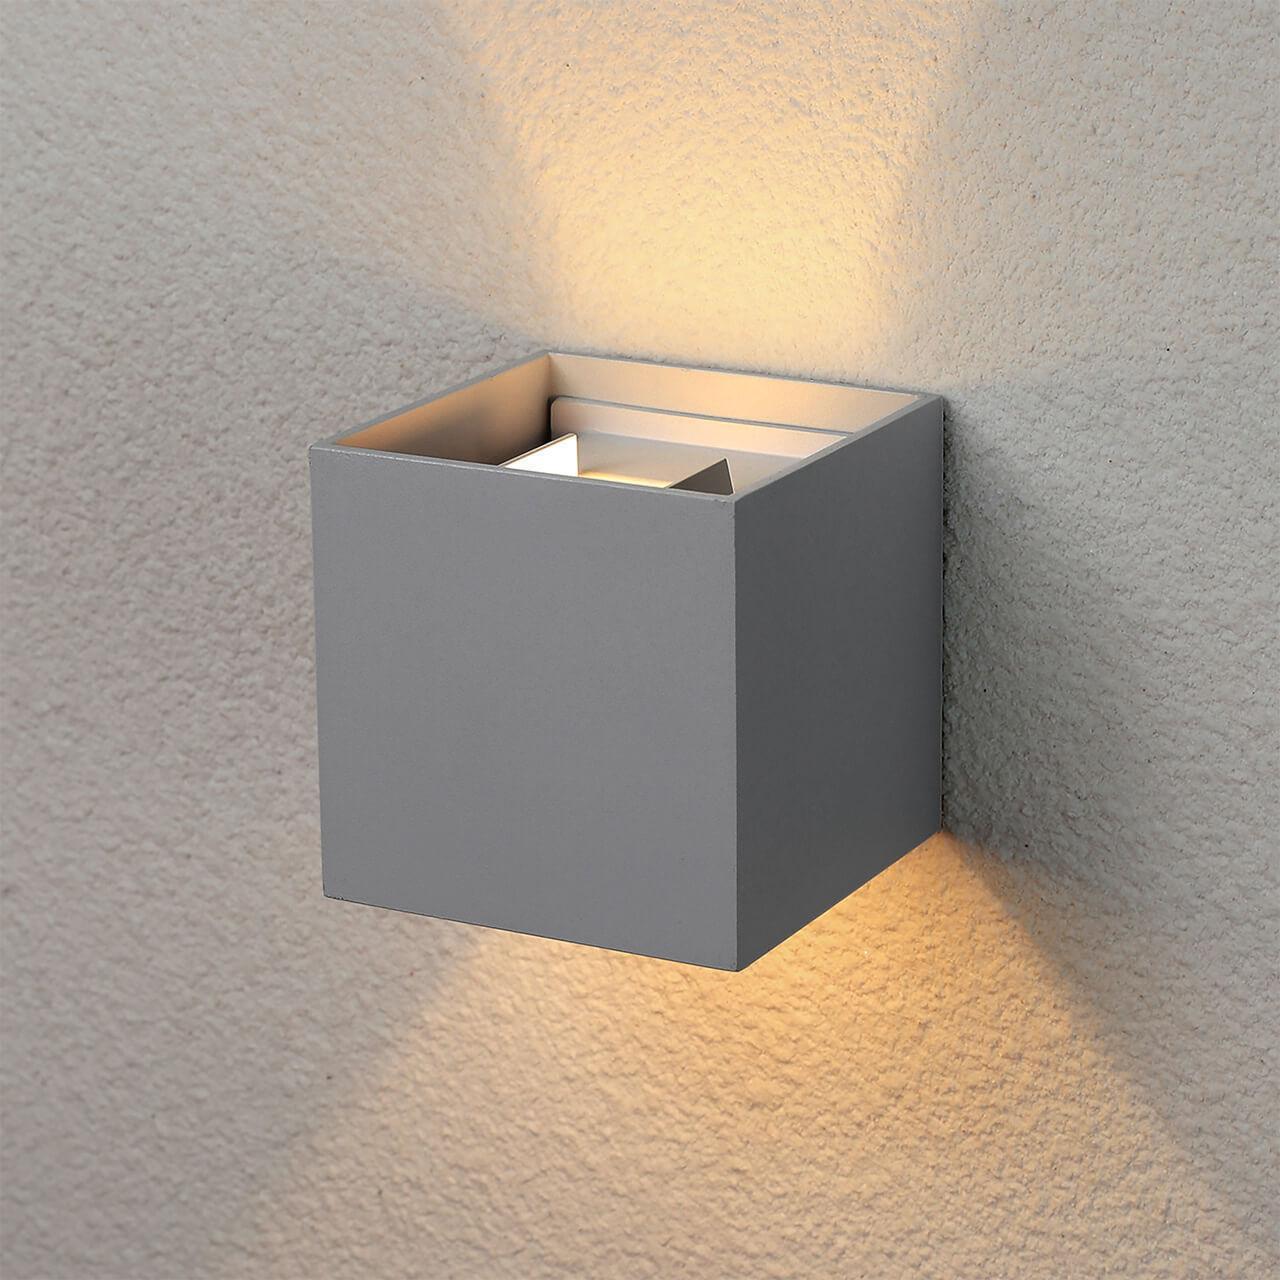 Уличный светильник Elektrostandard 4690389106262, LED уличный настенный светодиодный светильник elektrostandard 1605 techno led sokar графит 4690389086038